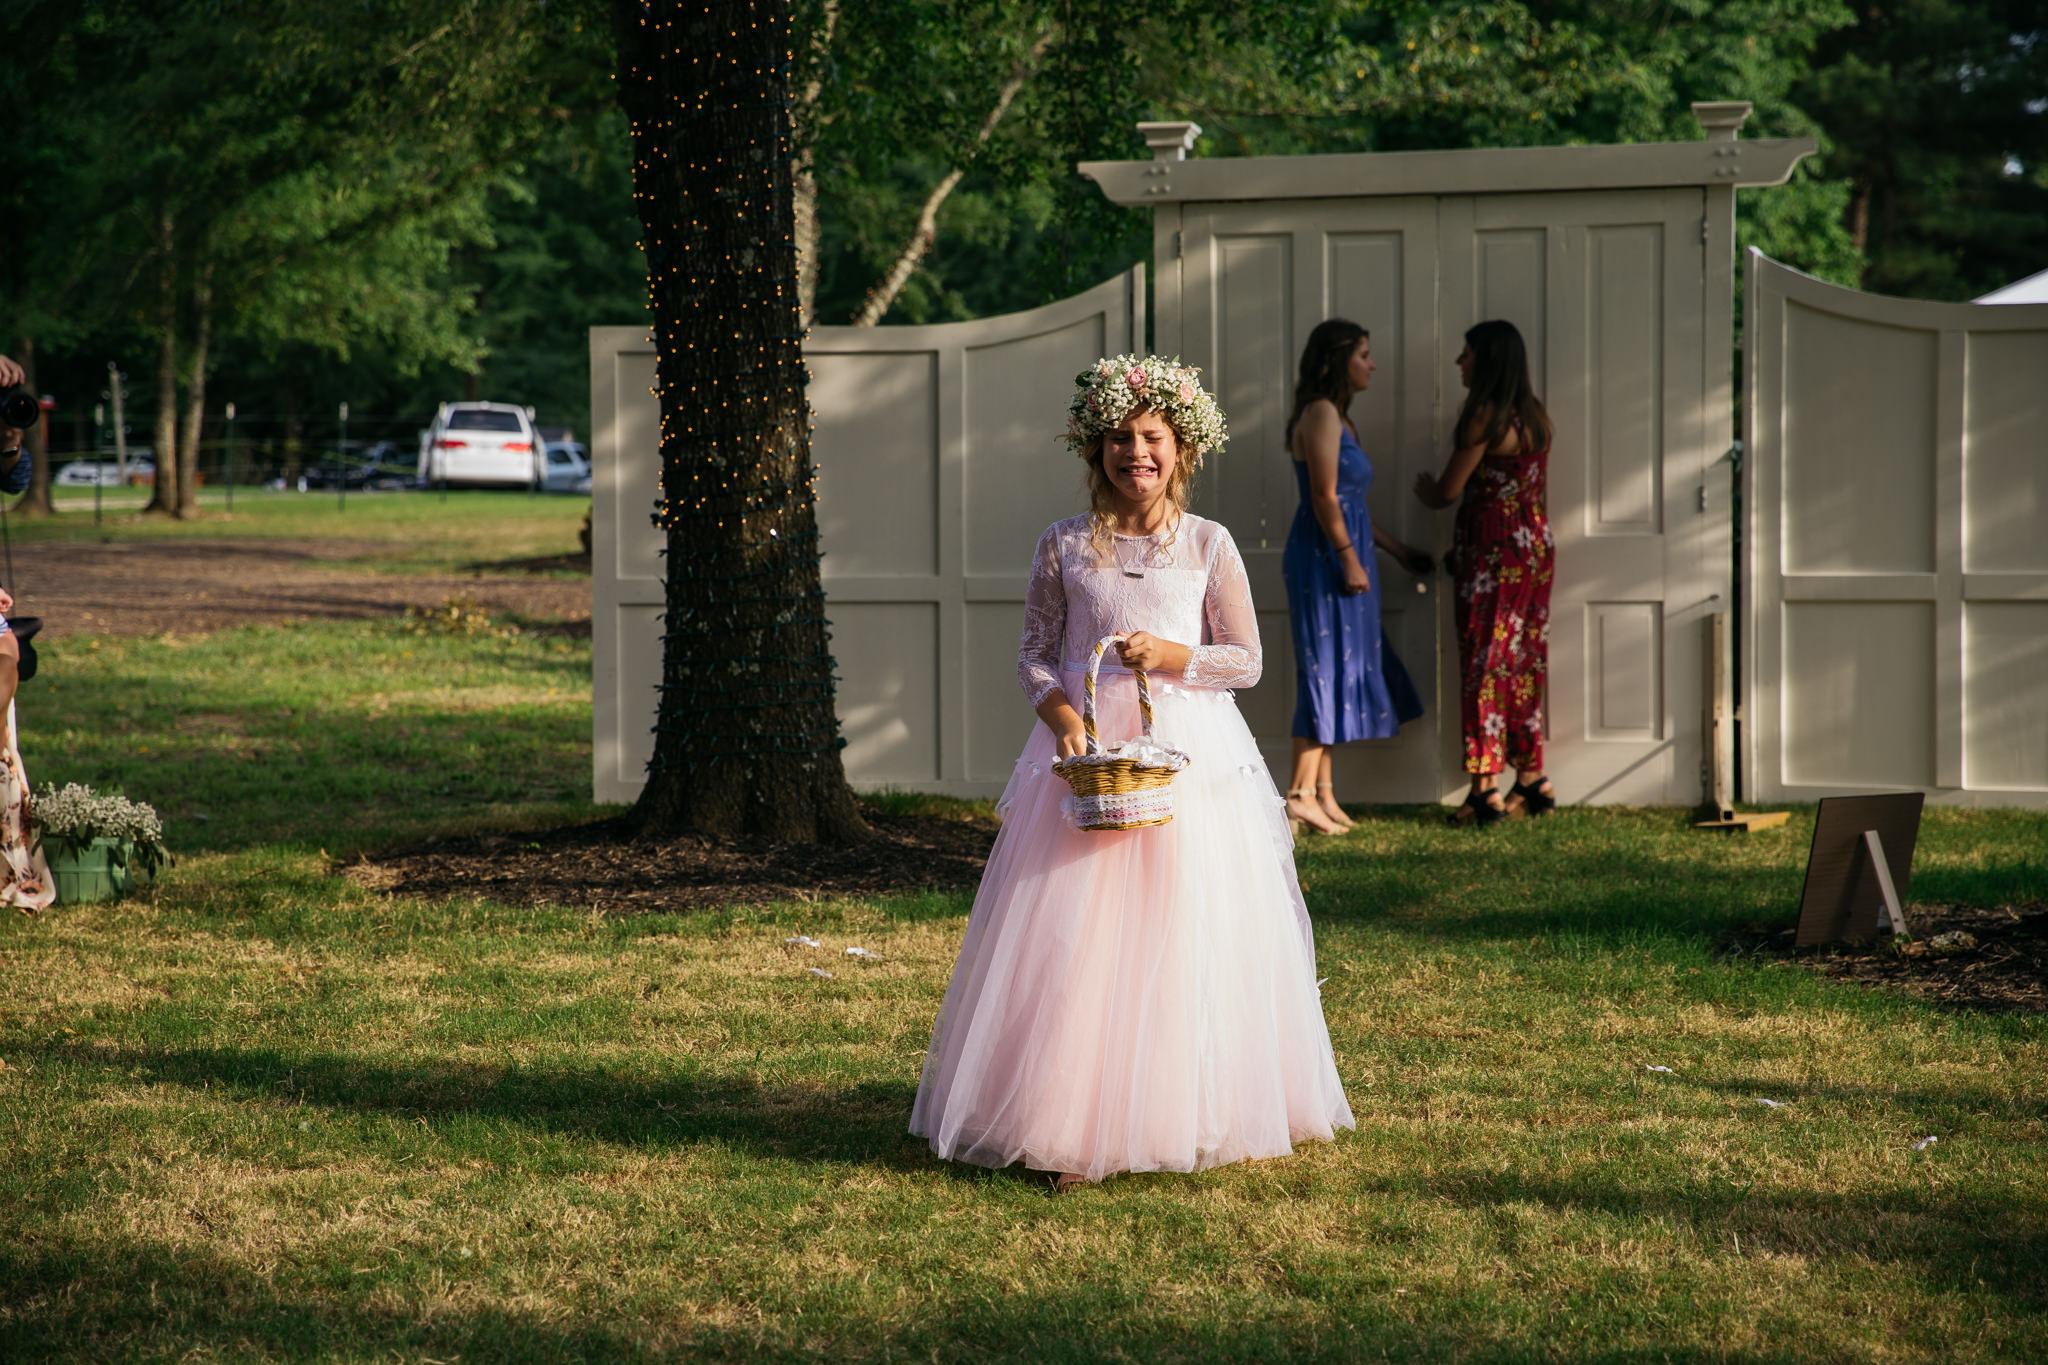 zbackyard-wedding-thewarmtharoundyou-lexy-branson-1.jpg